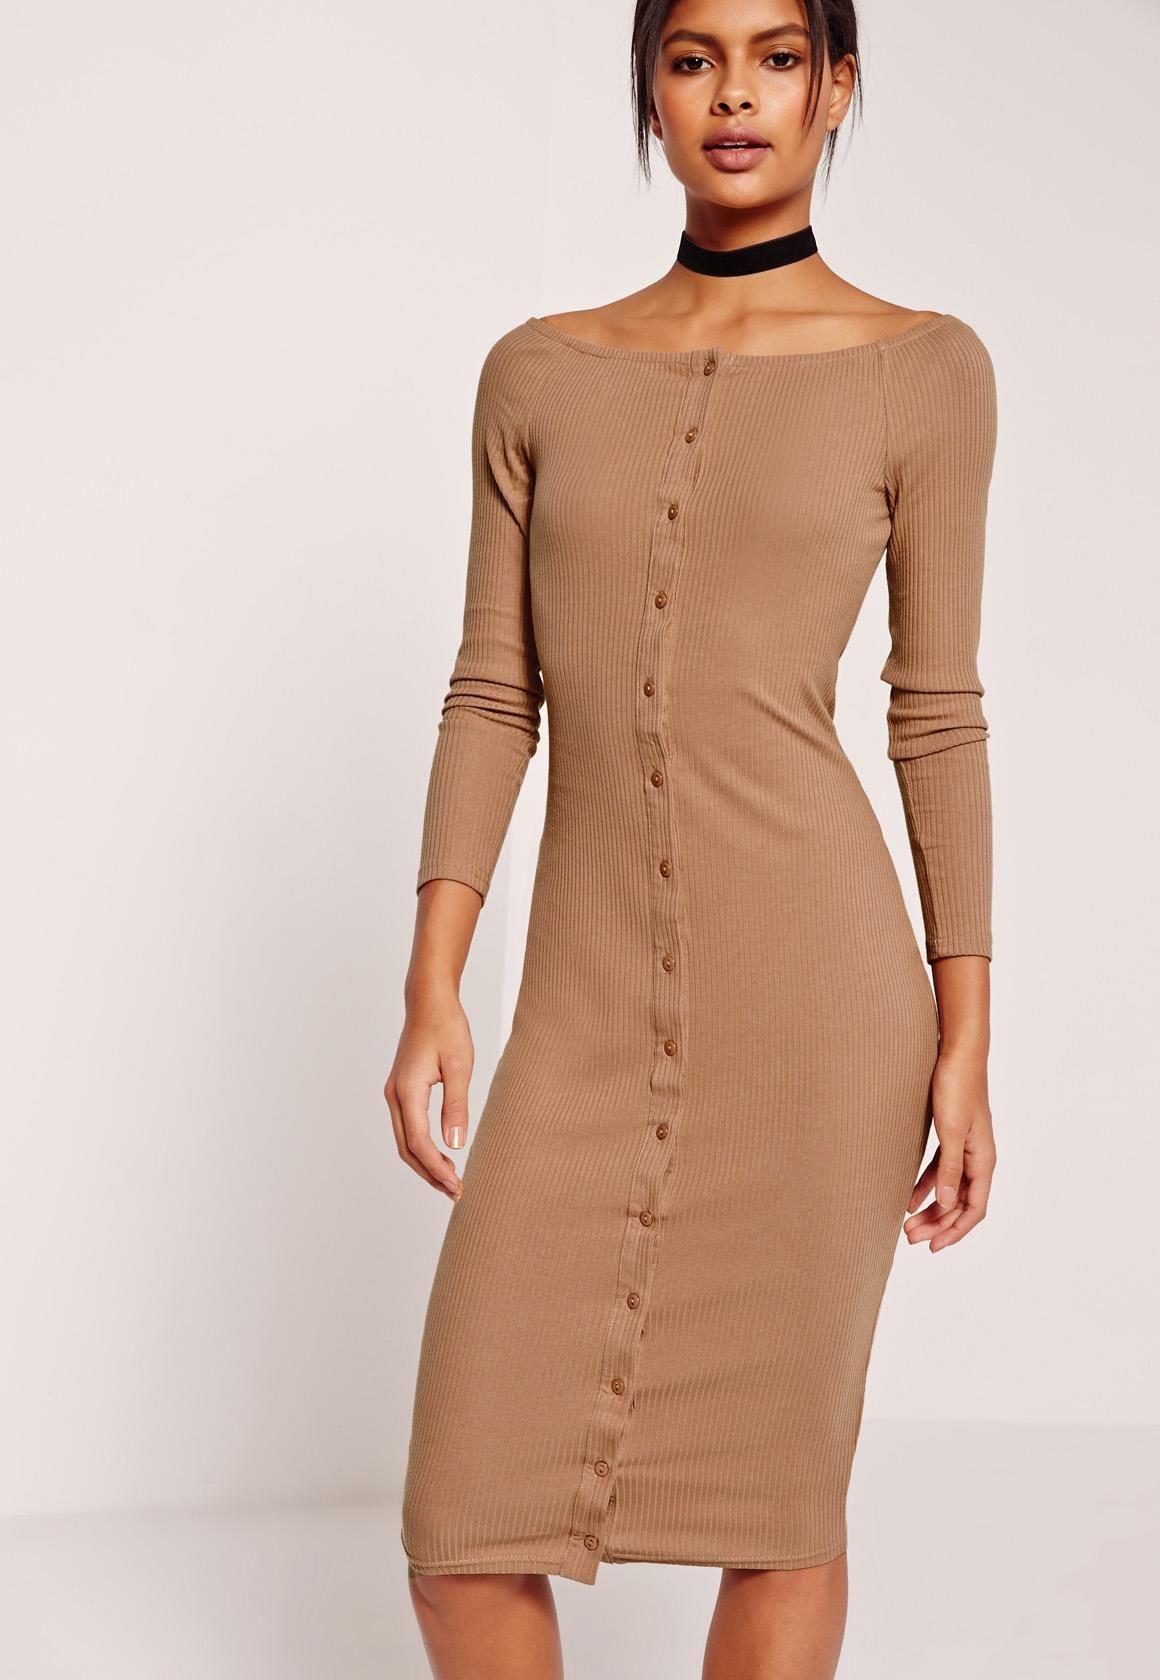 Missguided Long Sleeve Bardot Rib Midi Dress Tan Beige Long Sleeve Dress Ribbed Midi Dress Casual Day Dresses [ 1680 x 1160 Pixel ]